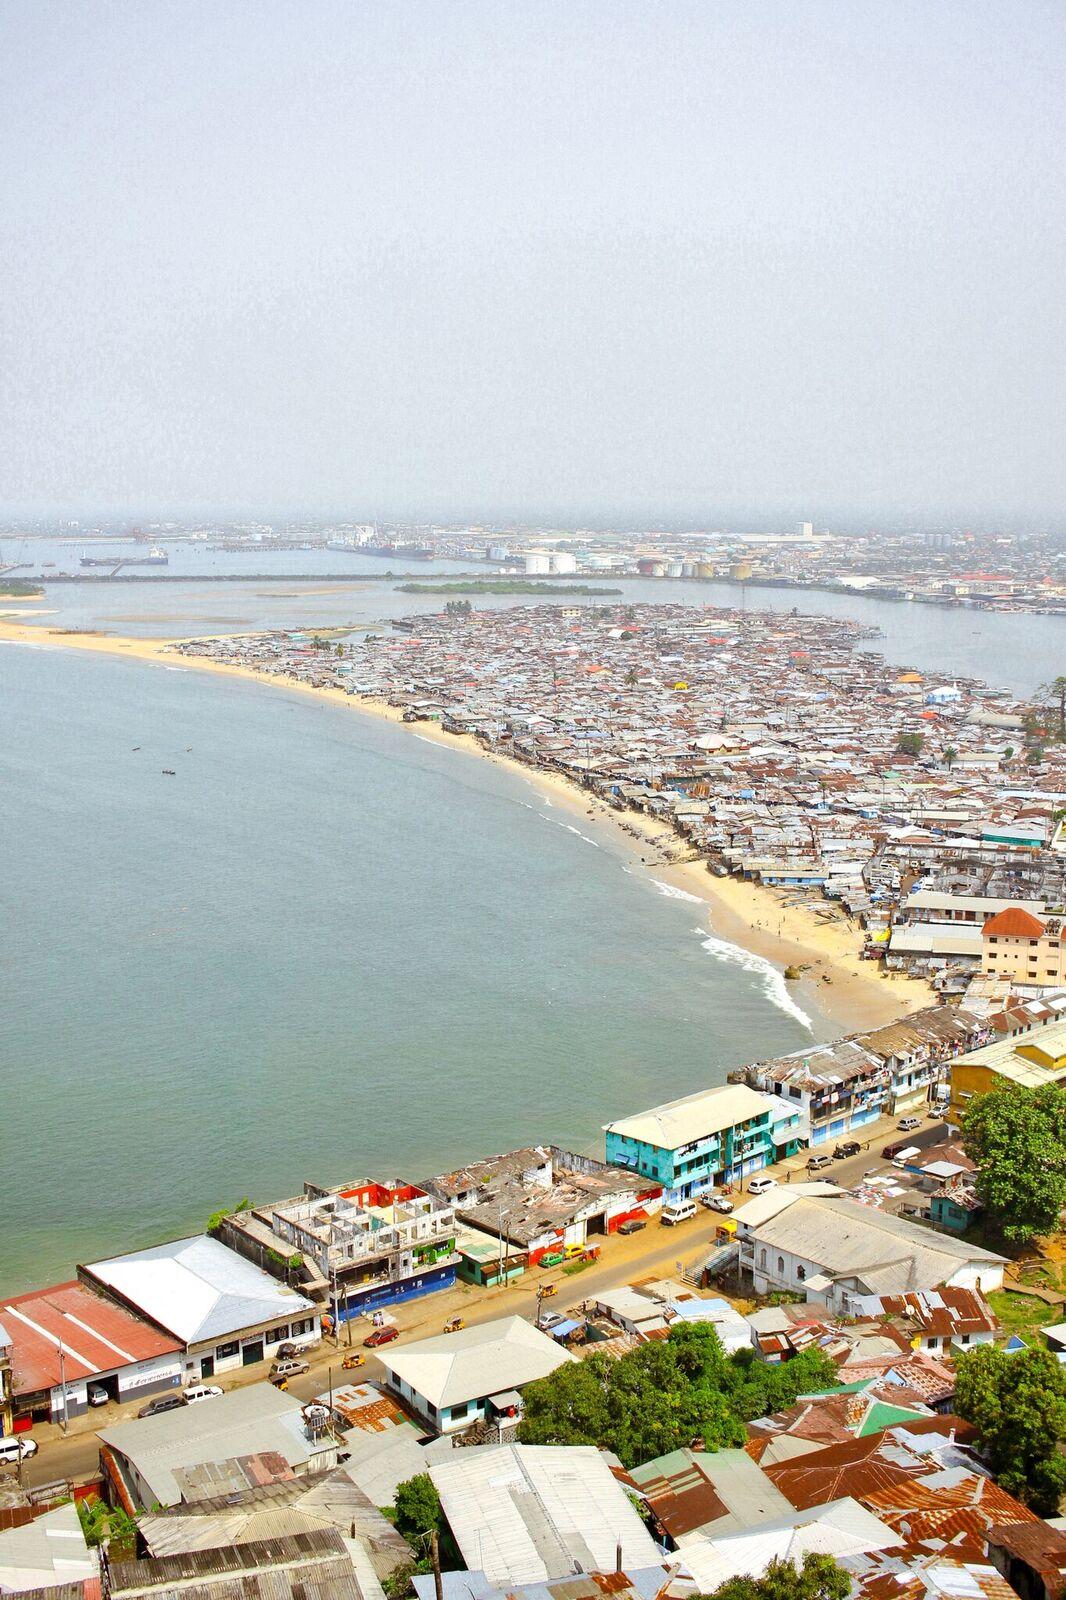 Aerial view of coast.jpeg